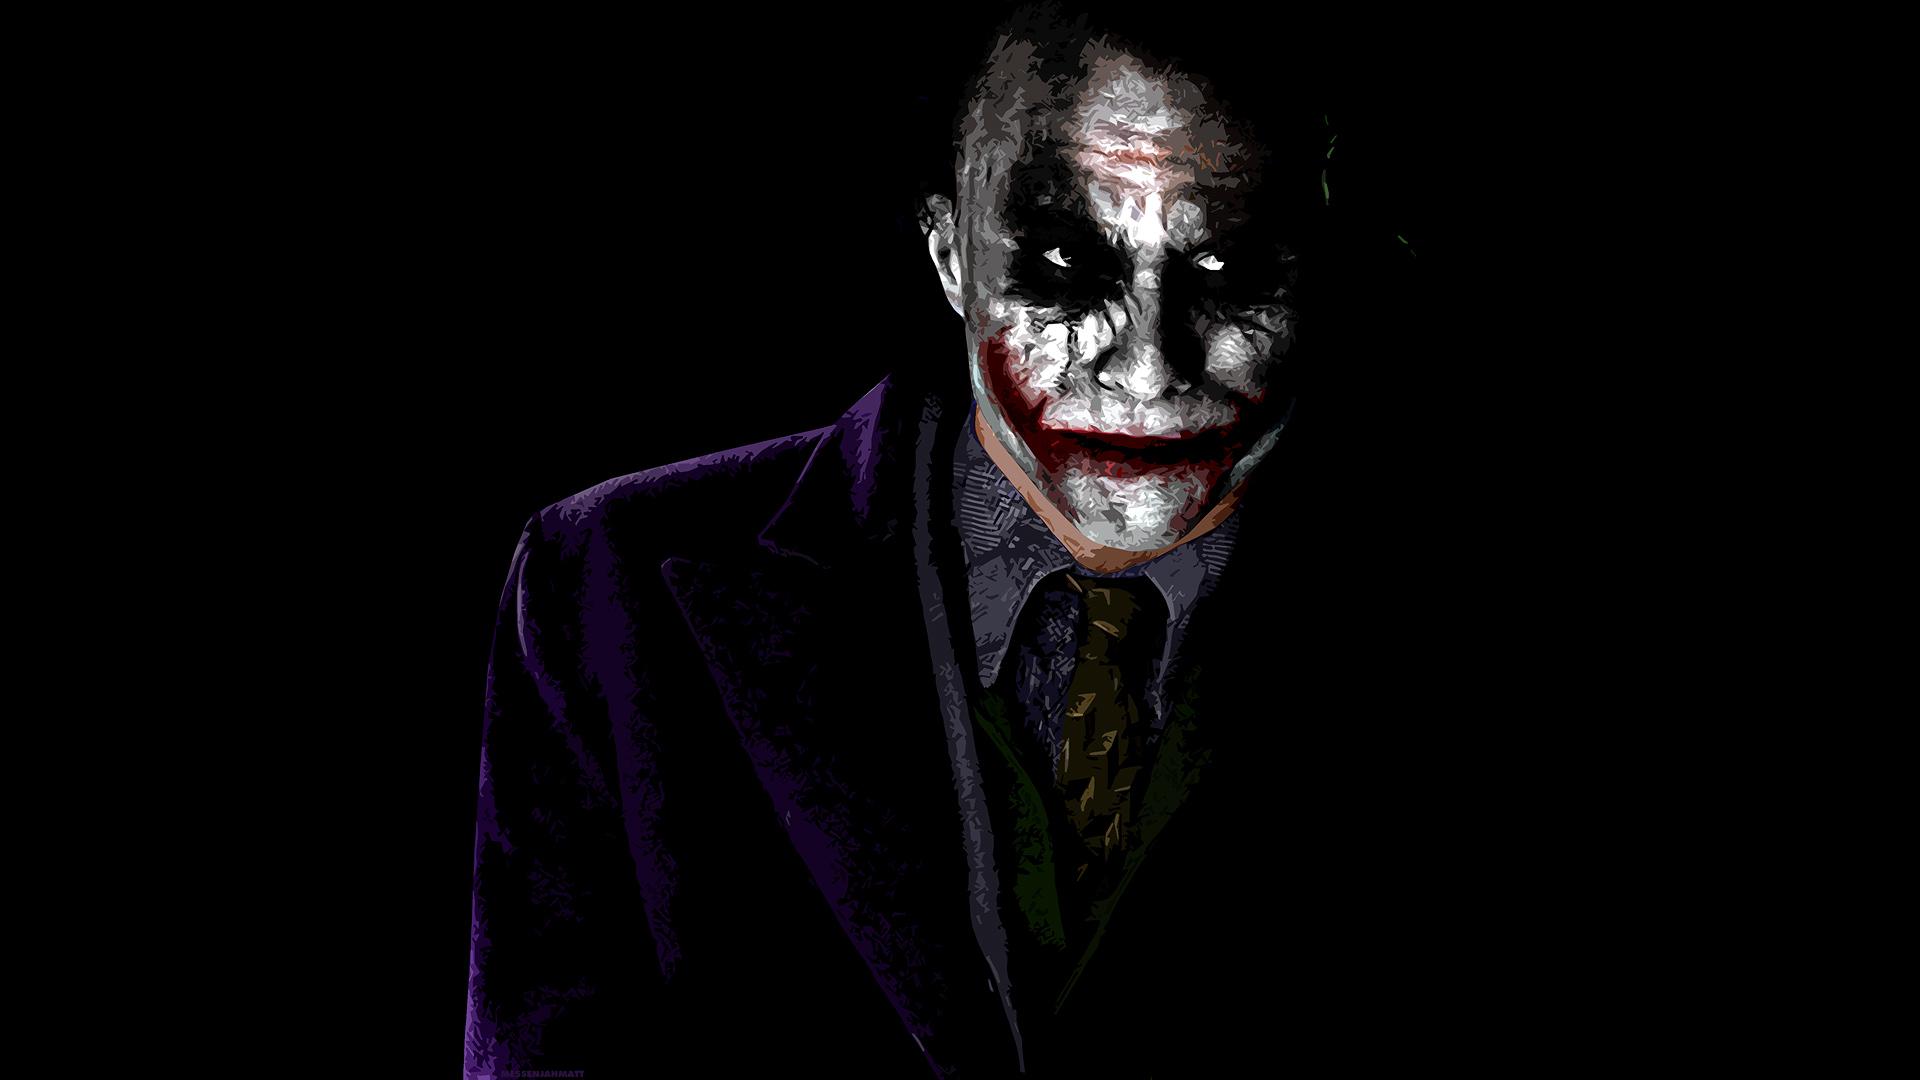 joker   The Joker Wallpaper 28092865 1920x1080